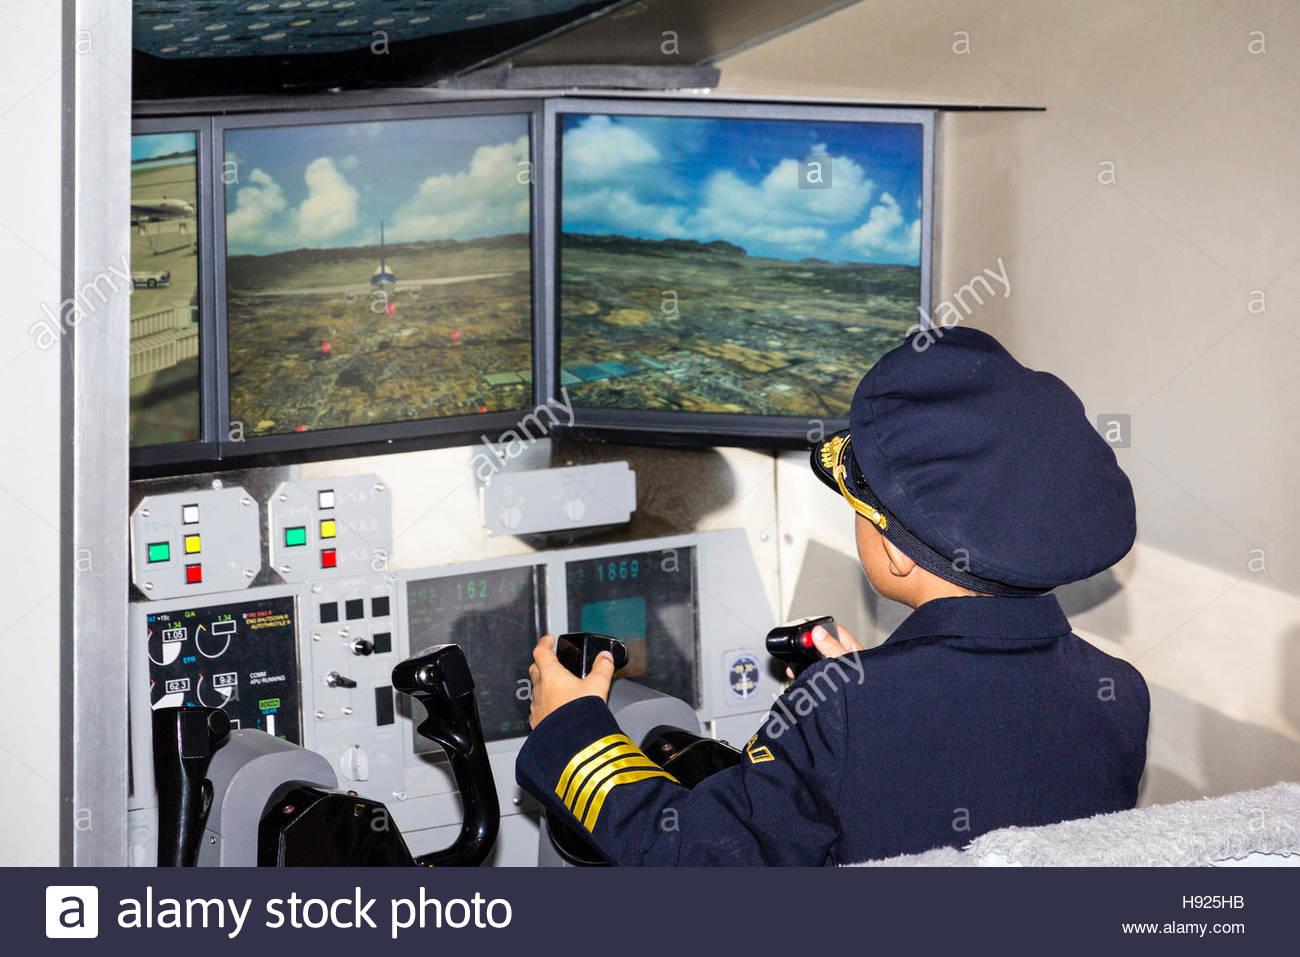 Click image for larger version.  Name:japan-nishinomiya-kidzania-ana-flight-simulators-with-boy-child-in-H925HB.jpg Views:27 Size:151.8 KB ID:25492